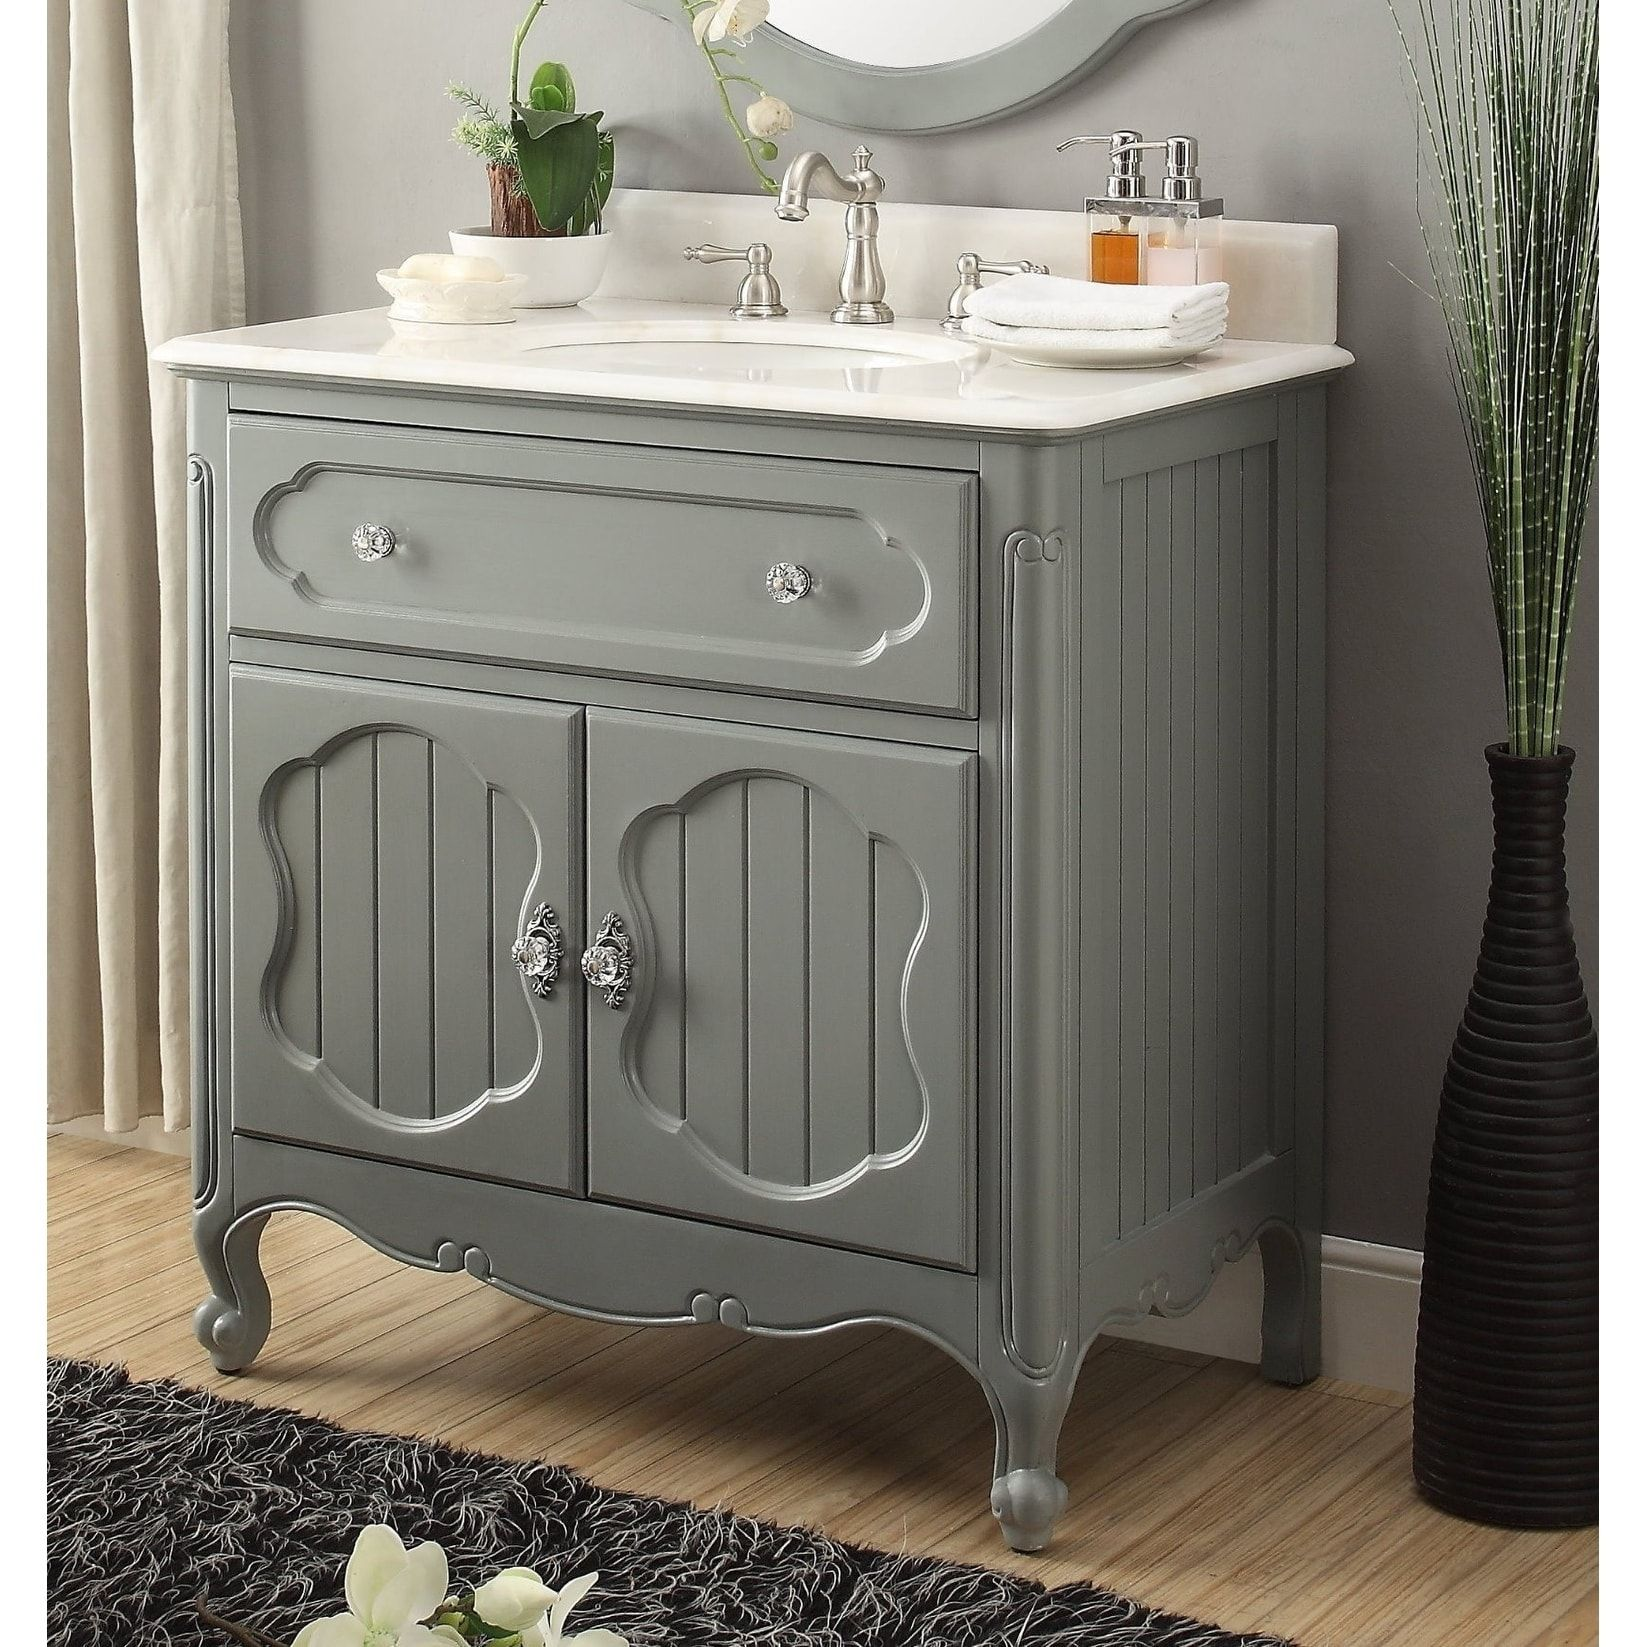 34 Benton Collection Knoxville Victorian Gray Bathroom Sink